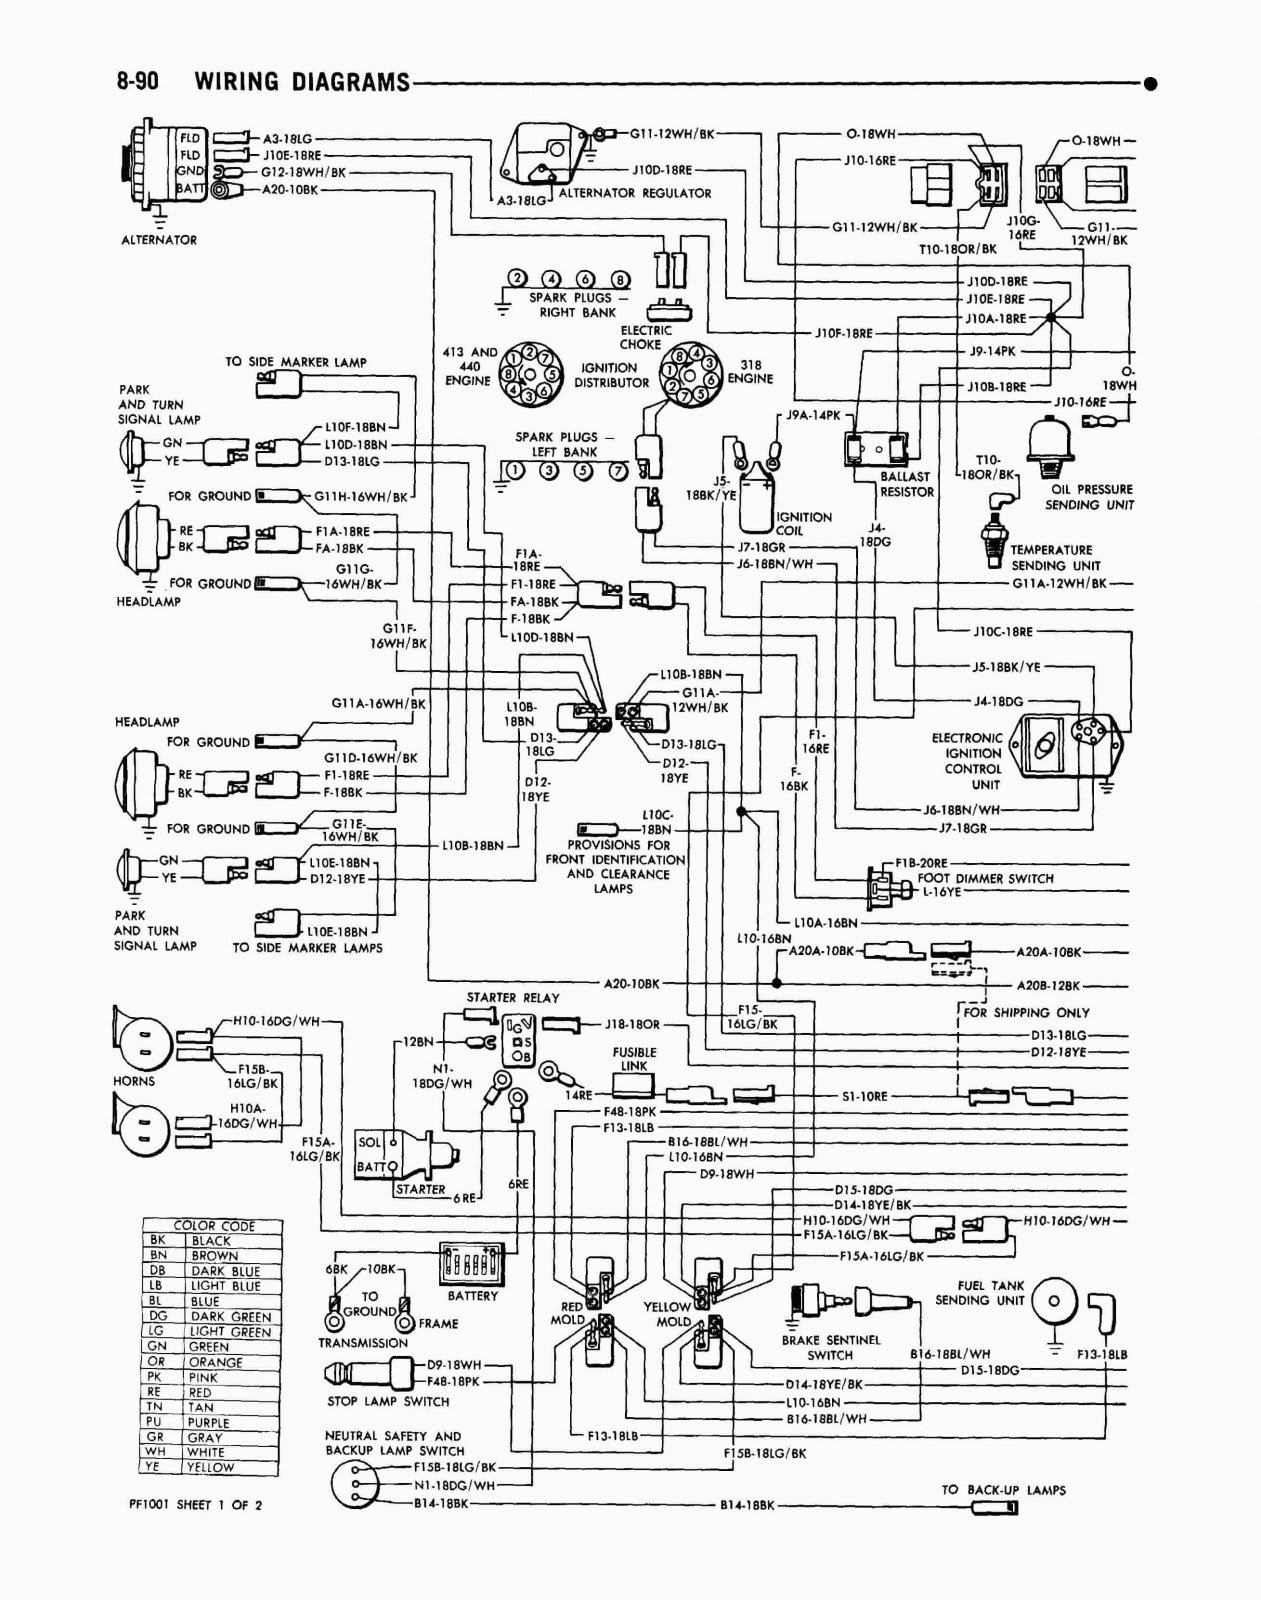 Diagram 1973 Dodge B300 Wiring Diagram Full Version Hd Quality Wiring Diagram Musicwiring Intoparadiso It